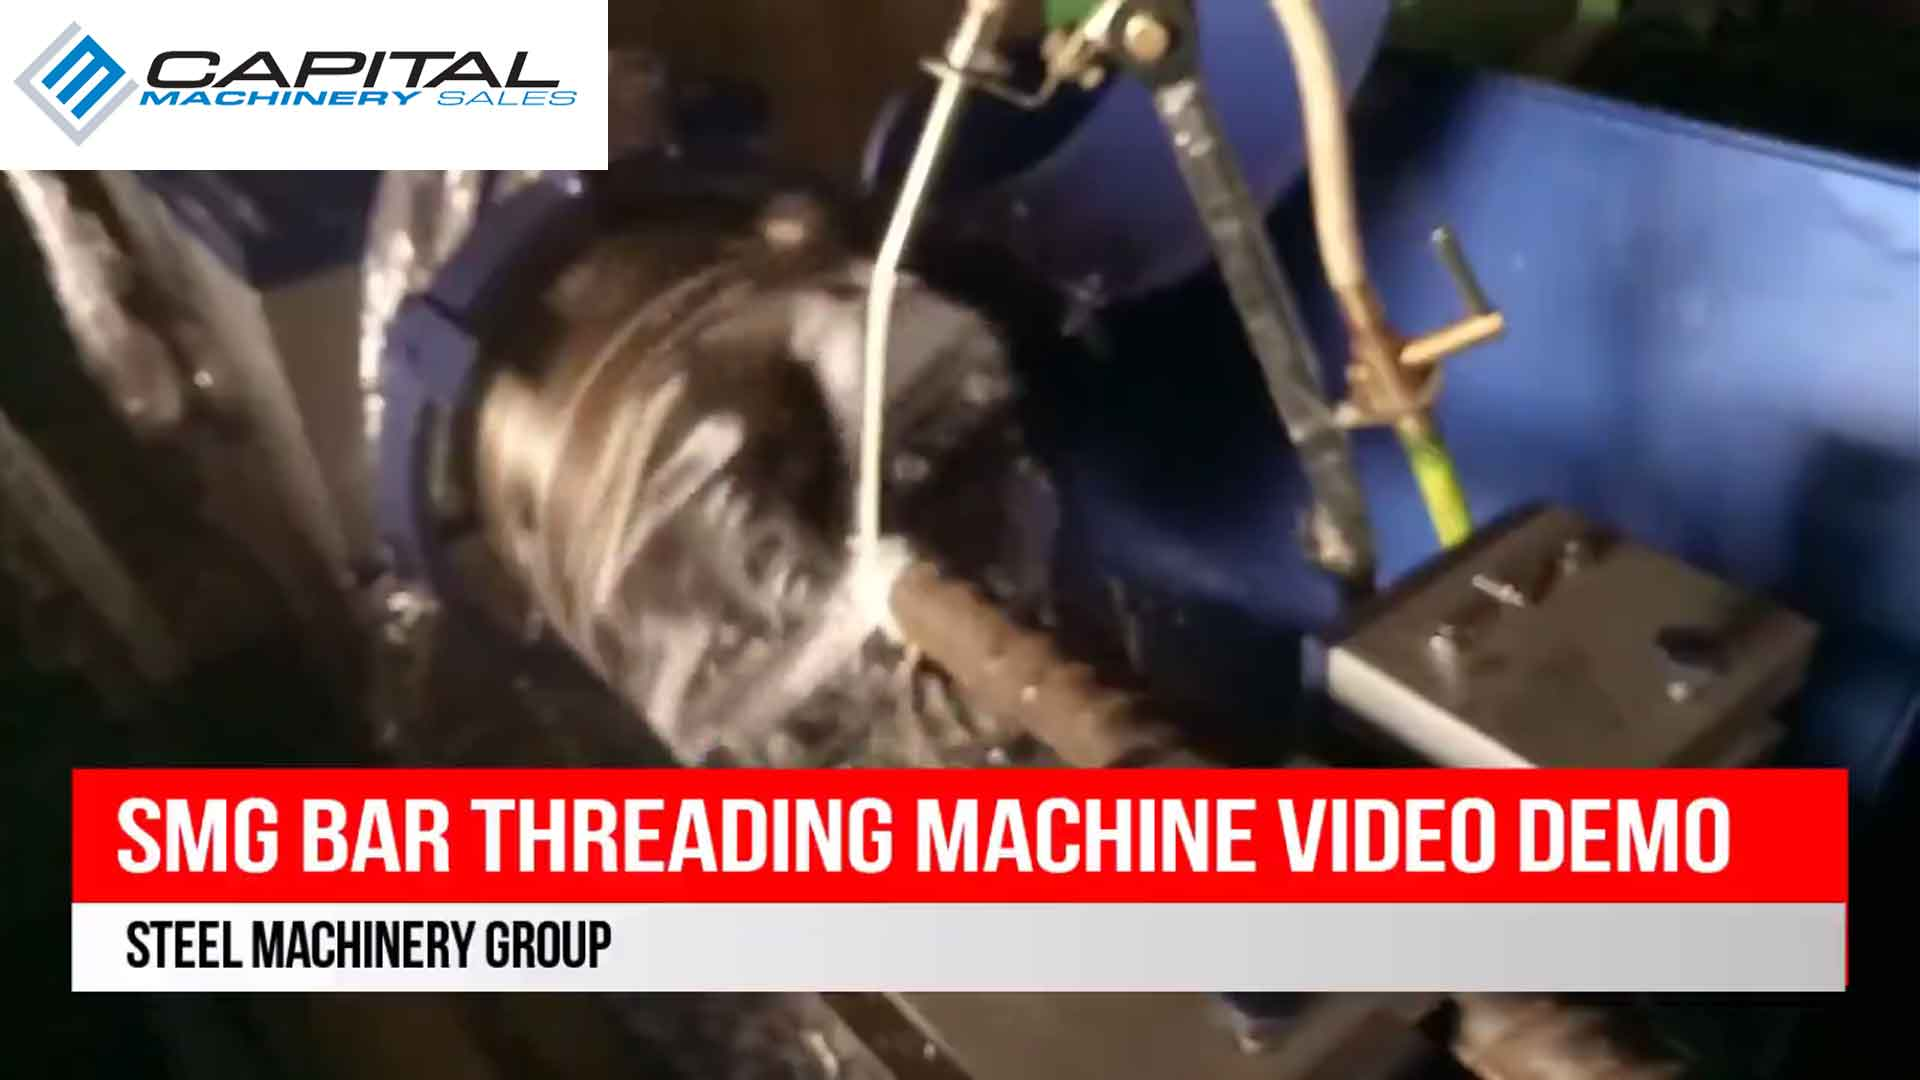 SMG Bar Threading Machine Video Demo